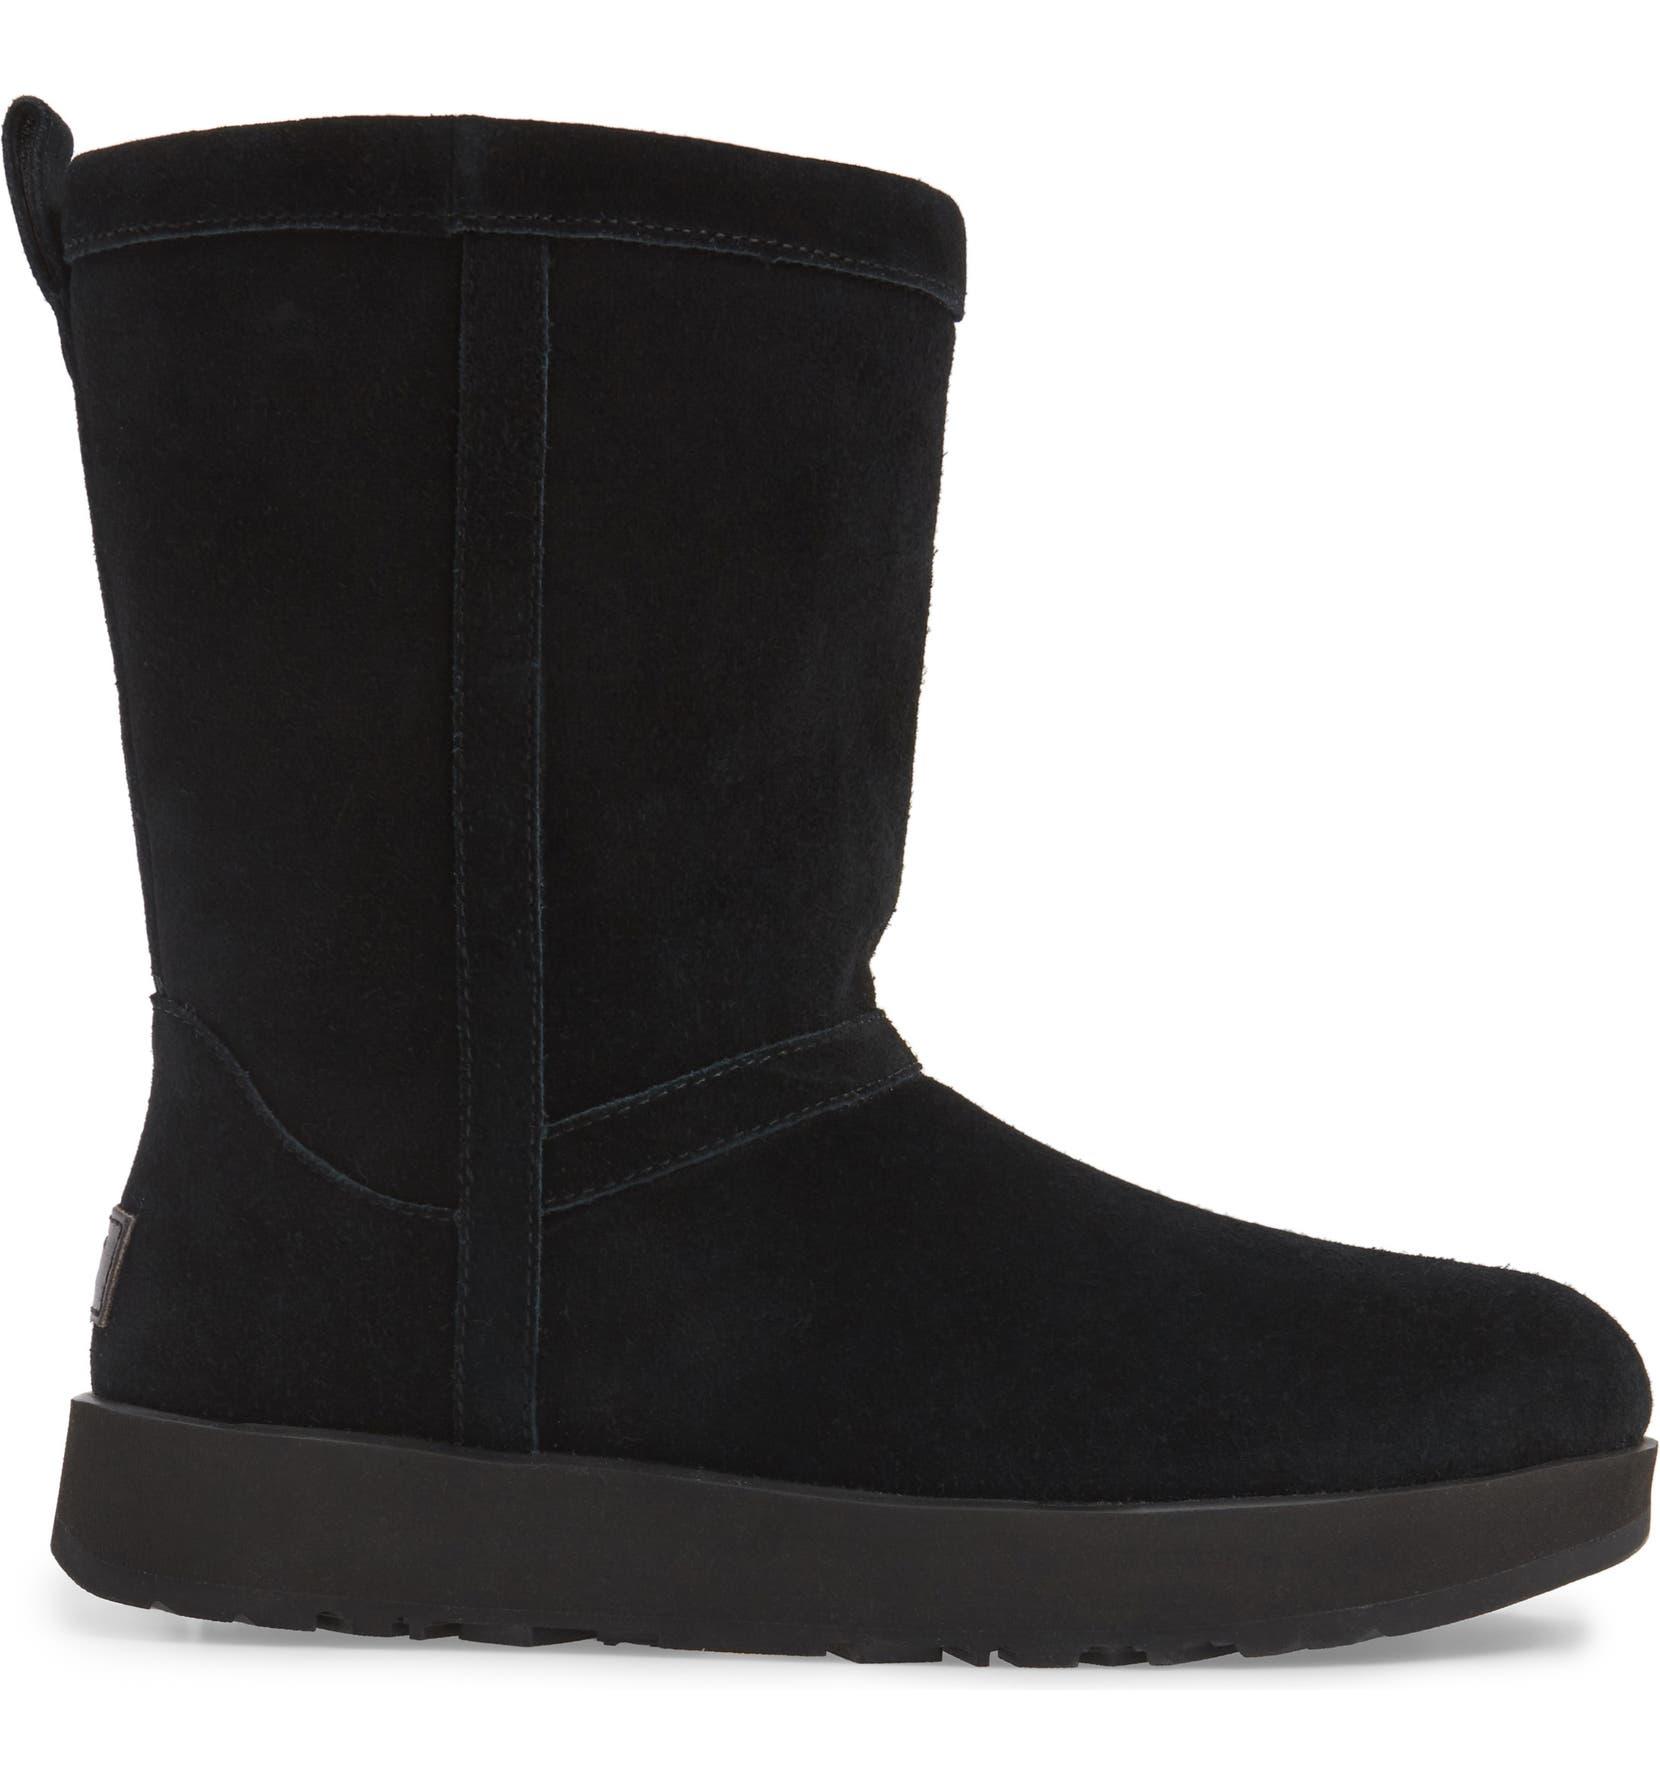 b85c73fc9b1 Classic Short Waterproof Boot